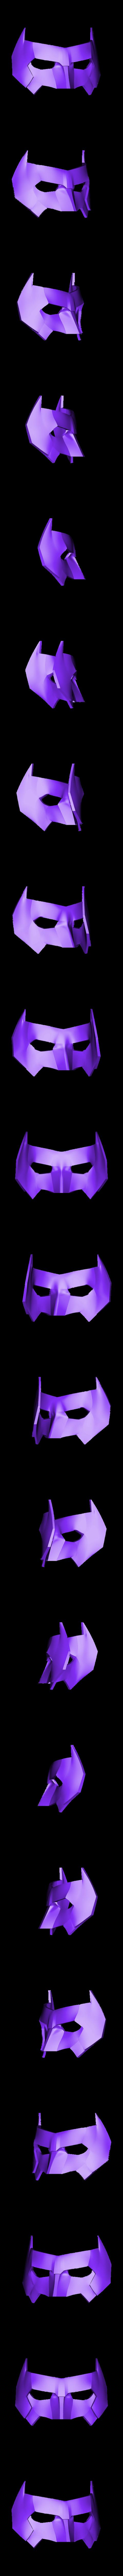 Kyle Rayner Mask Version 3.stl Download STL file Kyle Rayner Mask Green Lantern • 3D print object, VillainousPropShop